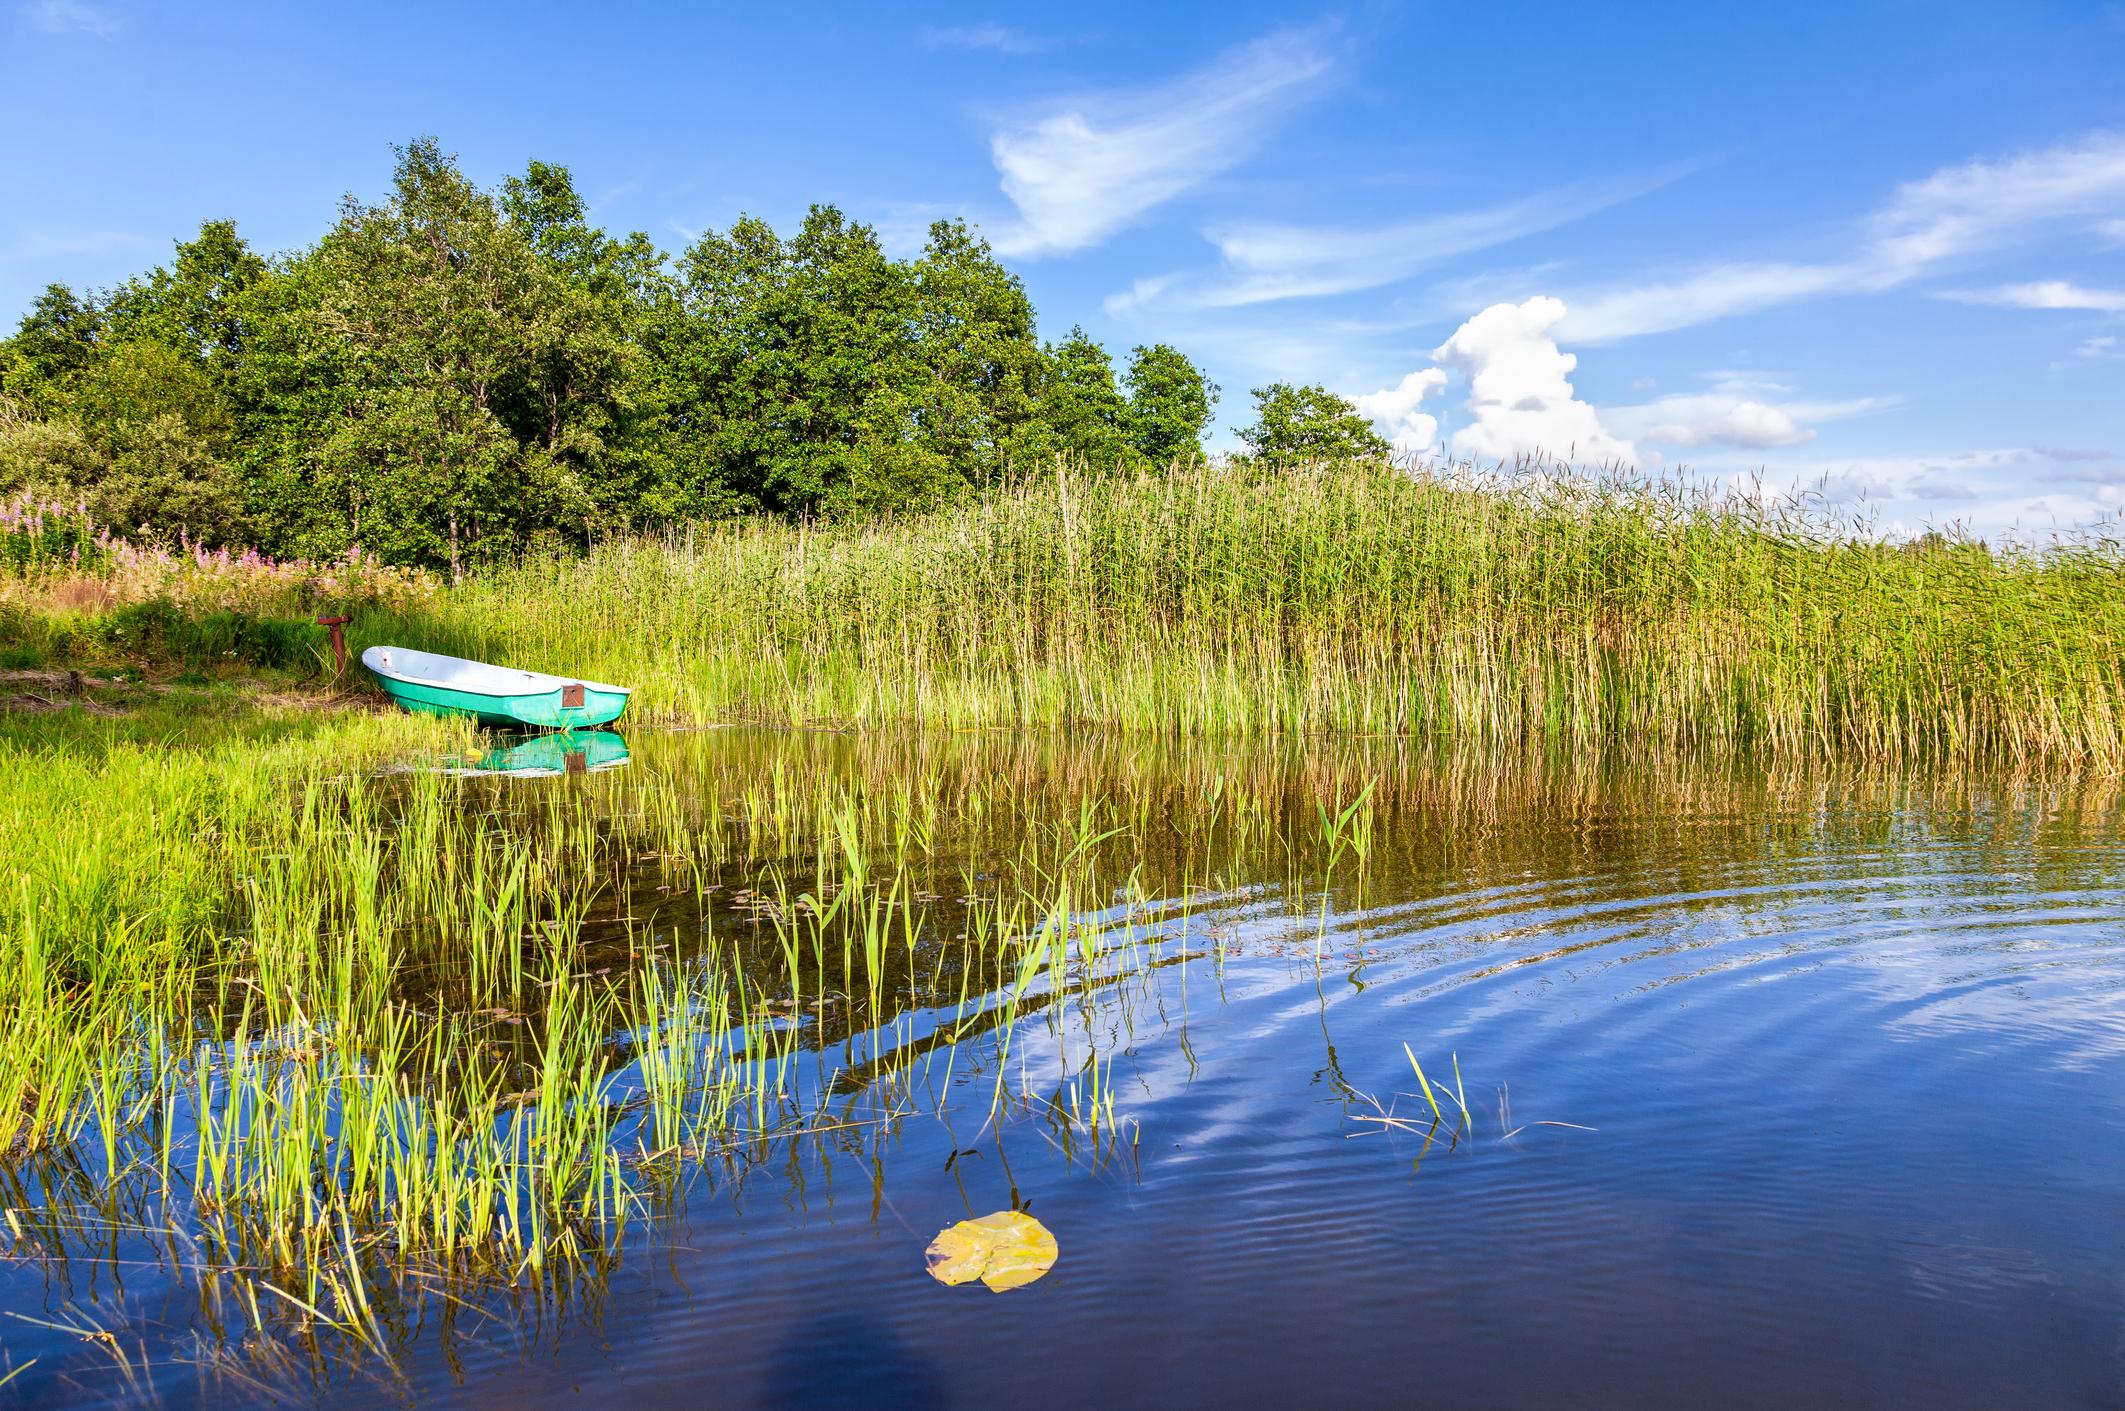 Improving Fish Habitat in Small Ponds